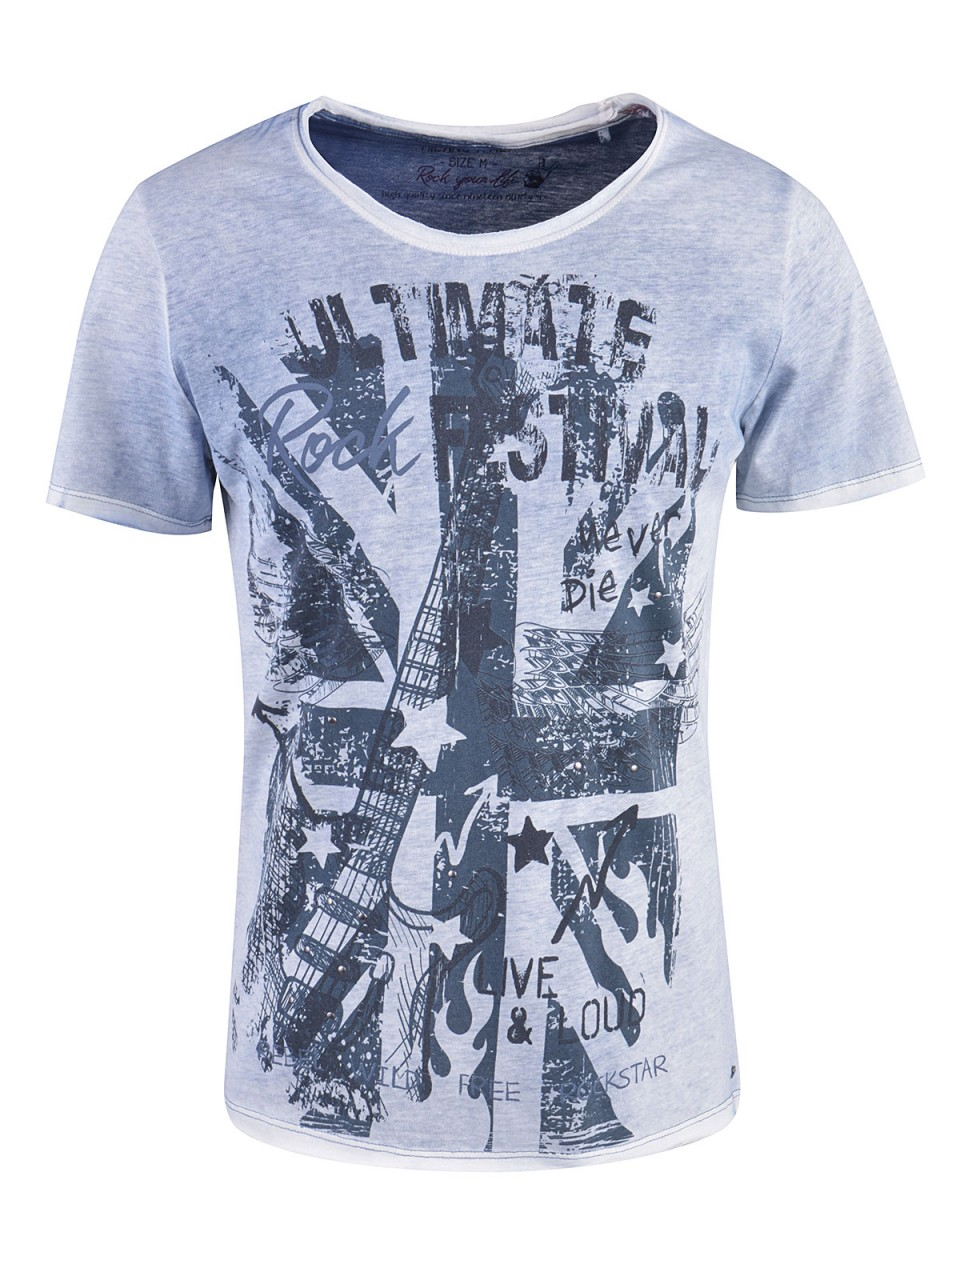 milano-italy-herren-t-shirt-blau, 12.48 EUR @ designermode-com-mode